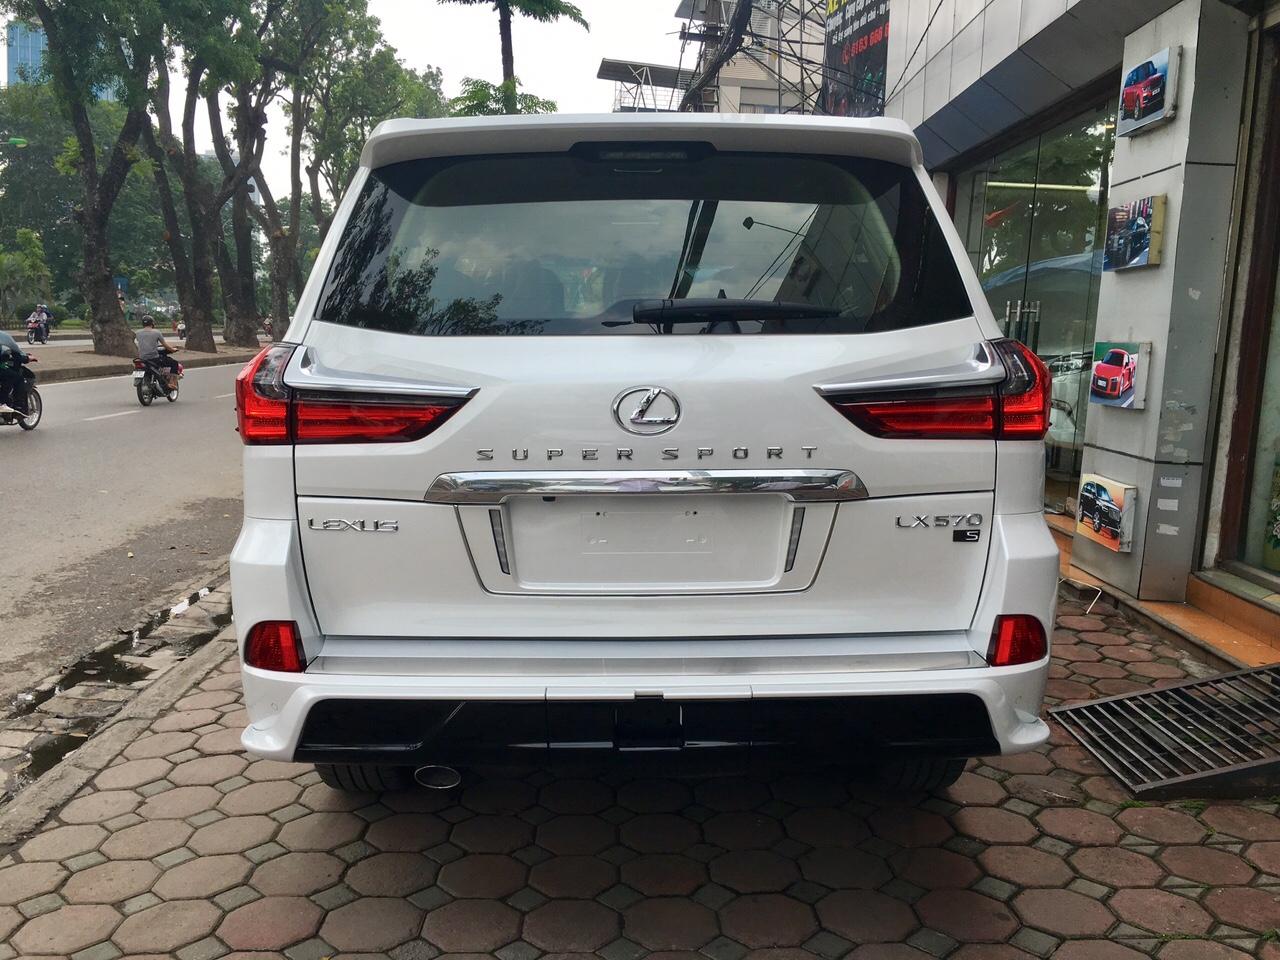 đuôi xe Lexus LX570 Super Sport 2018